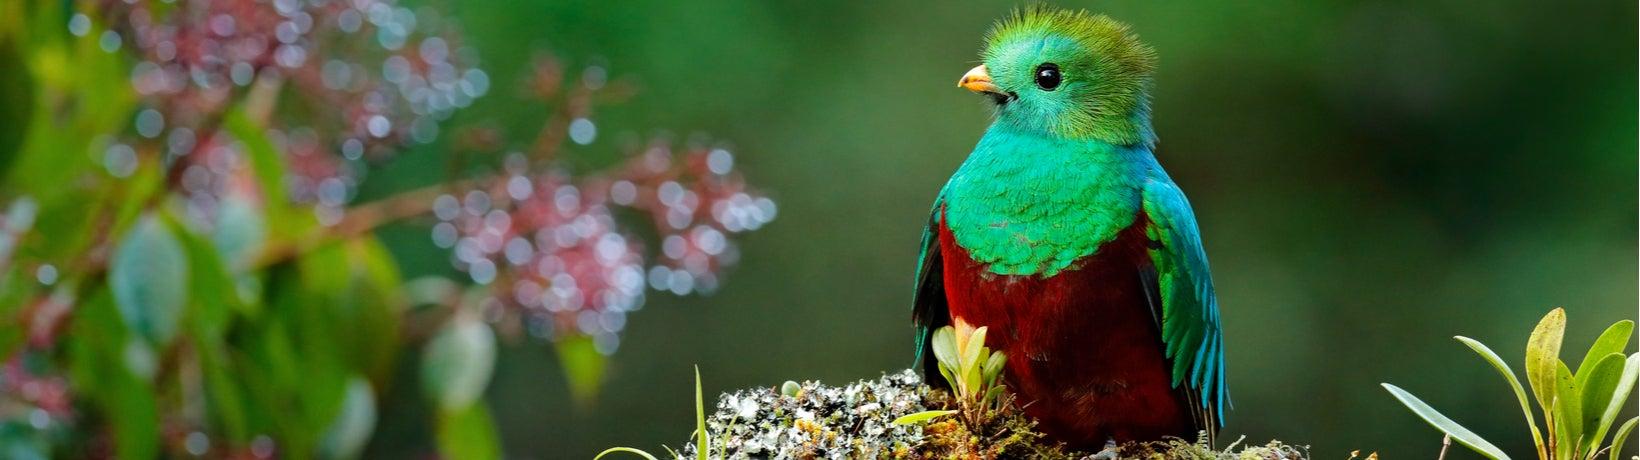 Resplendent Quetzal (Pharomachrus mocinno); Savegre, Costa Rica; with green forest in background.  Photo: Ondrej Prosicky/Shutterstock